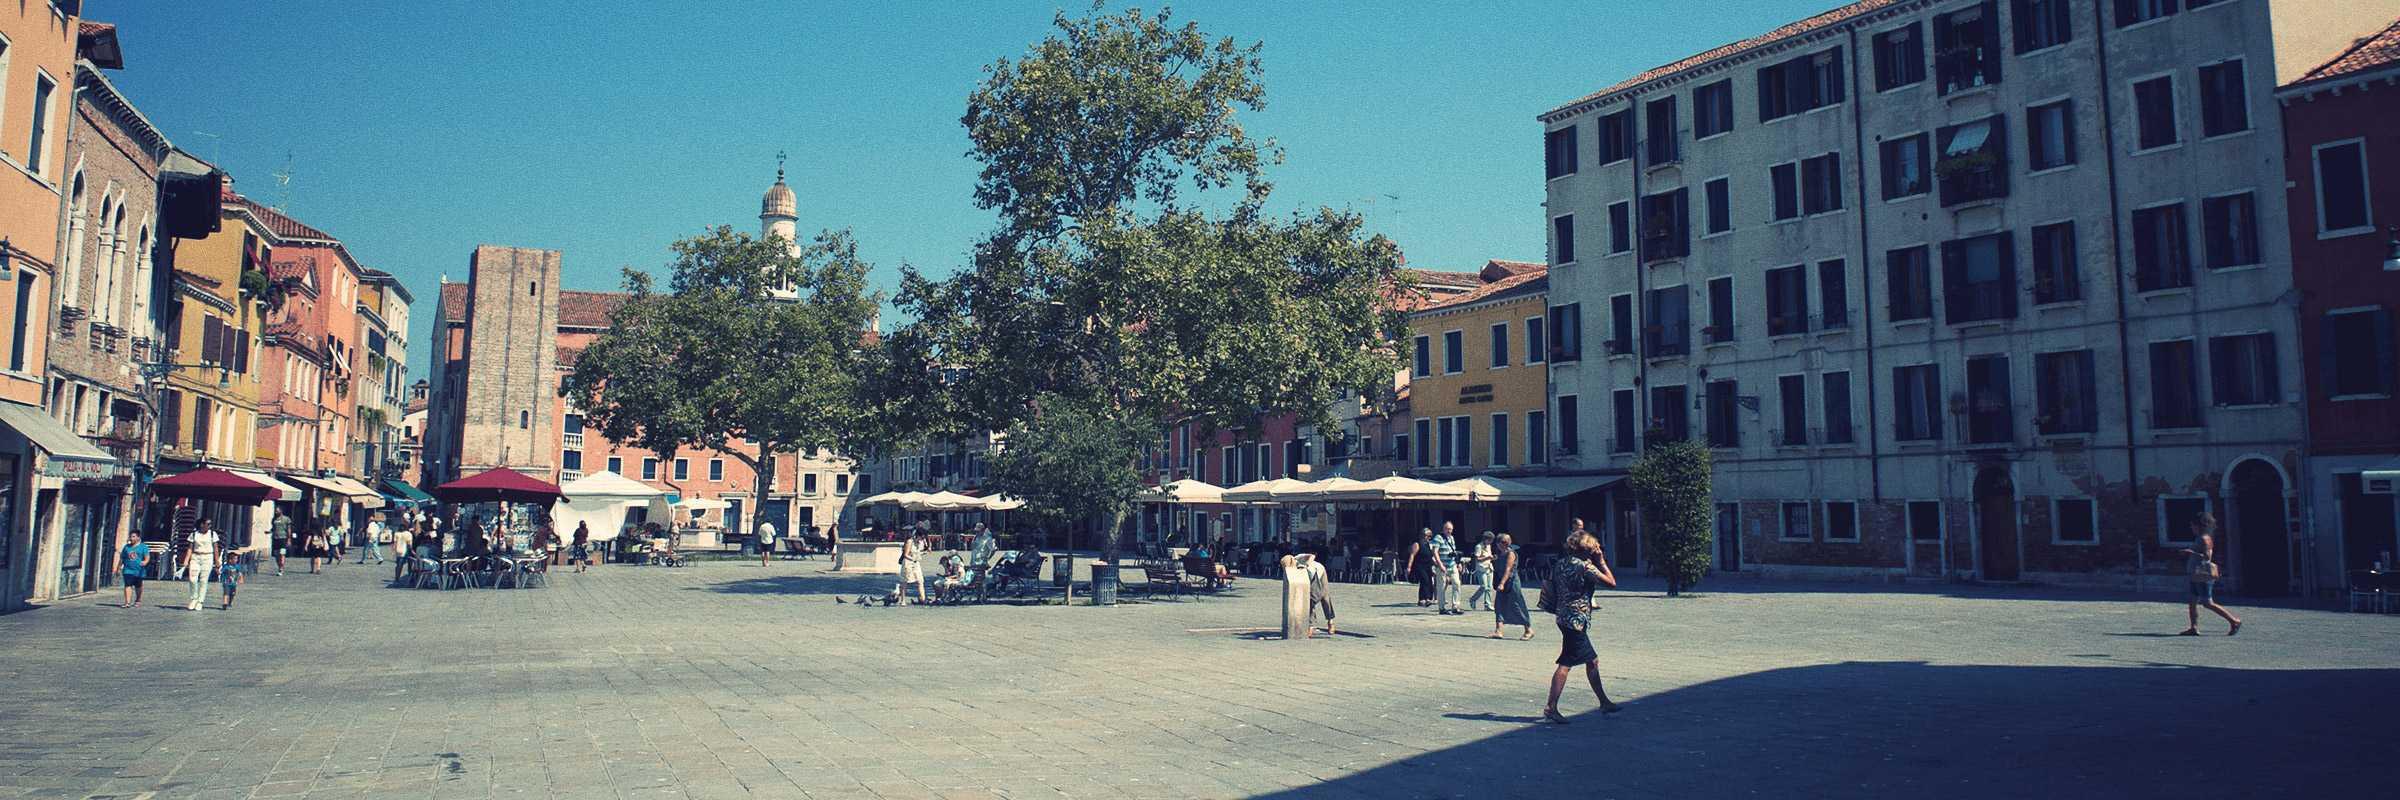 View on Santa Margherita fiel — (Venipedia/Bazzmann Archive)